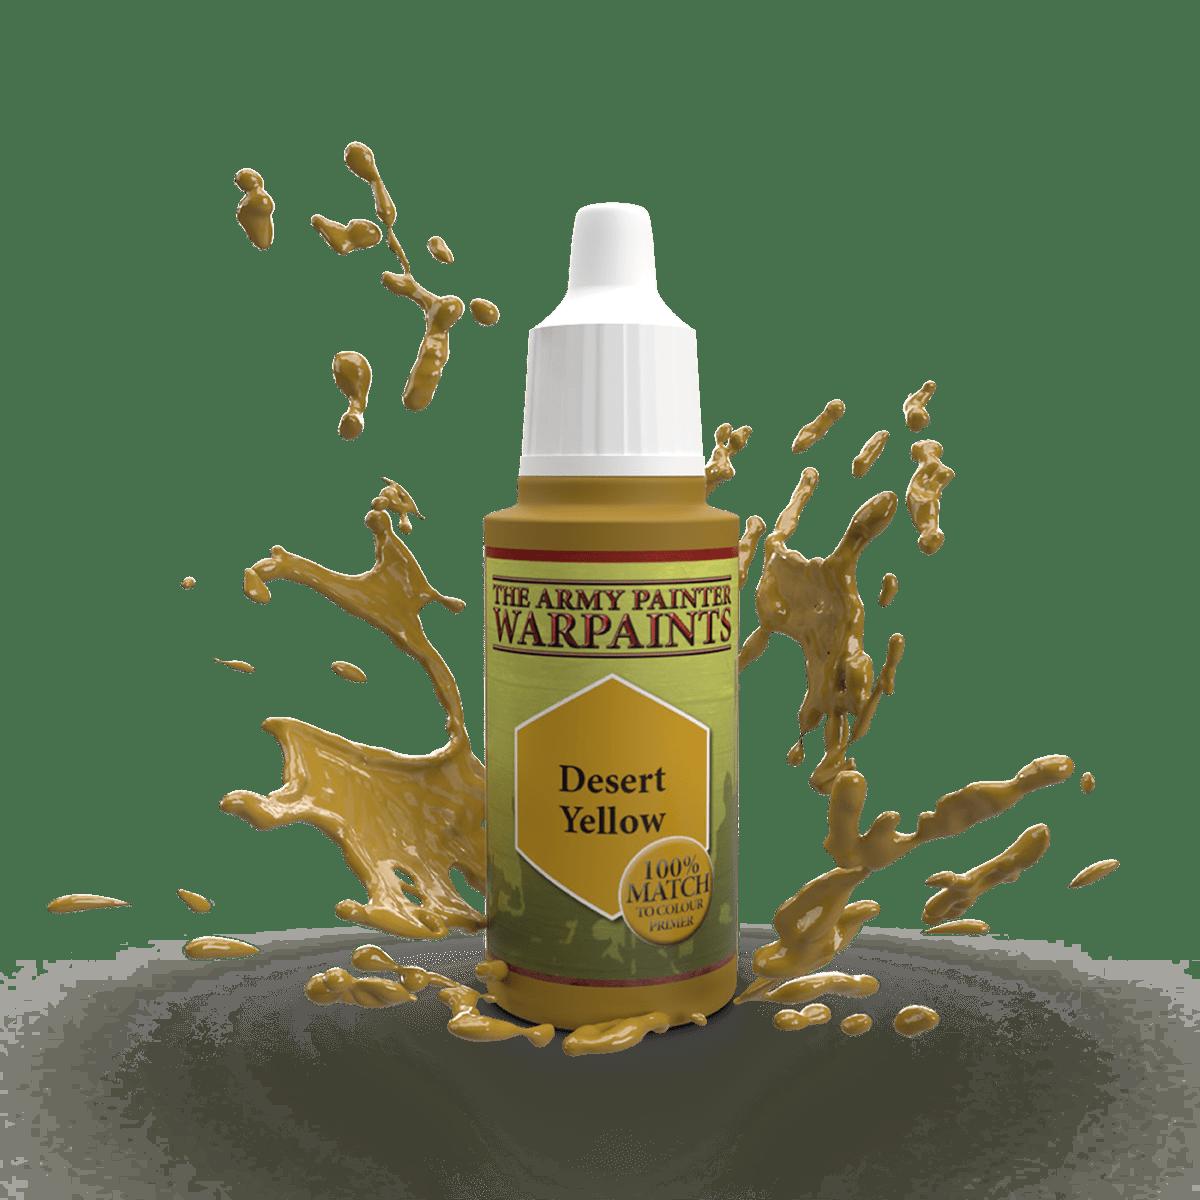 Army Painter Warpaint - Desert Yellow